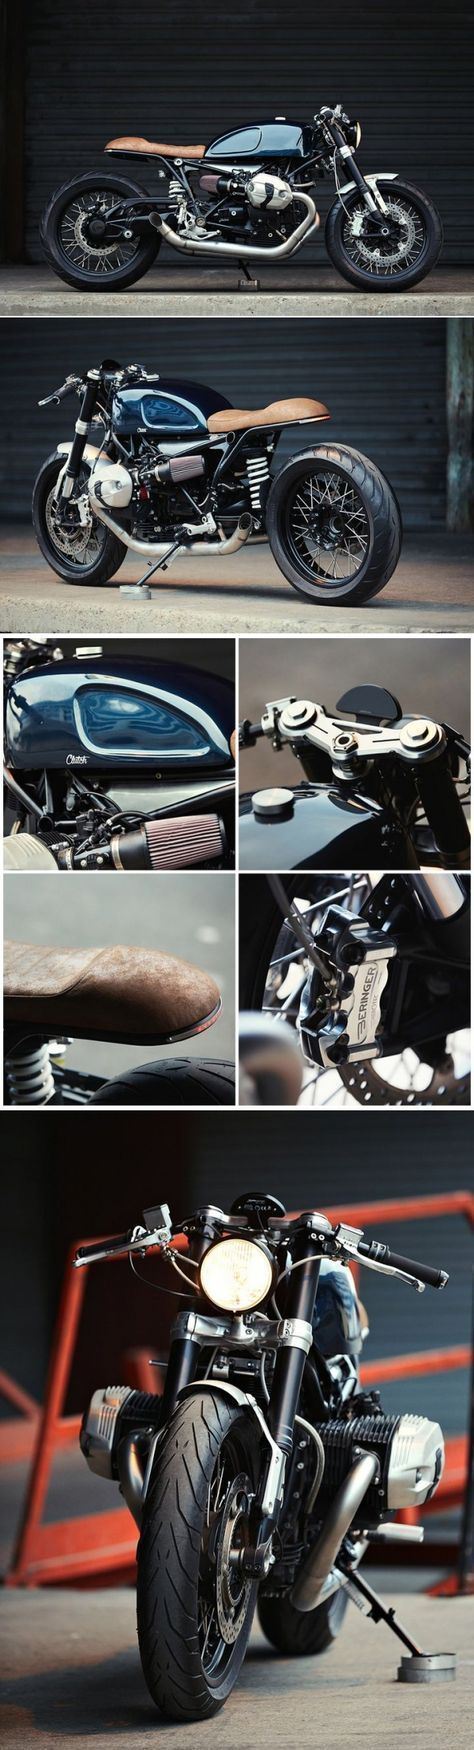 BMW R nineT Cafe Racer - Custom Motorcycles - #BMW ...- BMW R nineT Cafe Racer – Kundenspezifische Motorräder – #BMW #Cafe #Kundenspezi…  BMW R nineT Cafe Racer – Customized Motorcycles – #BMW #Cafe #Customized # Motorcycles #NINET   -#custommotorcyclesblack #custommotorcyclesharley #custommotorcycleshonda #custommotorcyclesretro #custommotorcyclesstyle